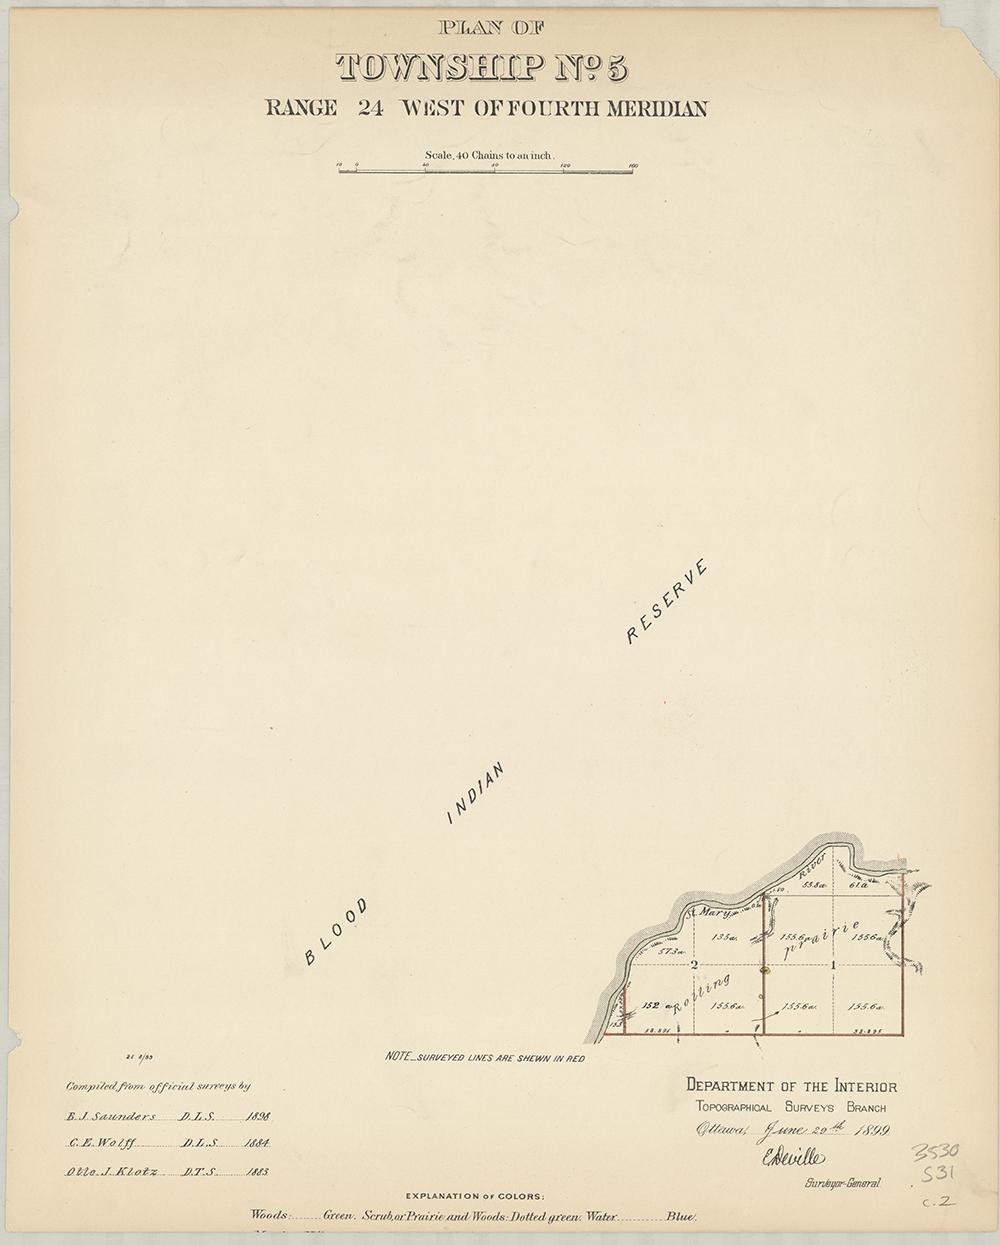 Plan of Township No.5